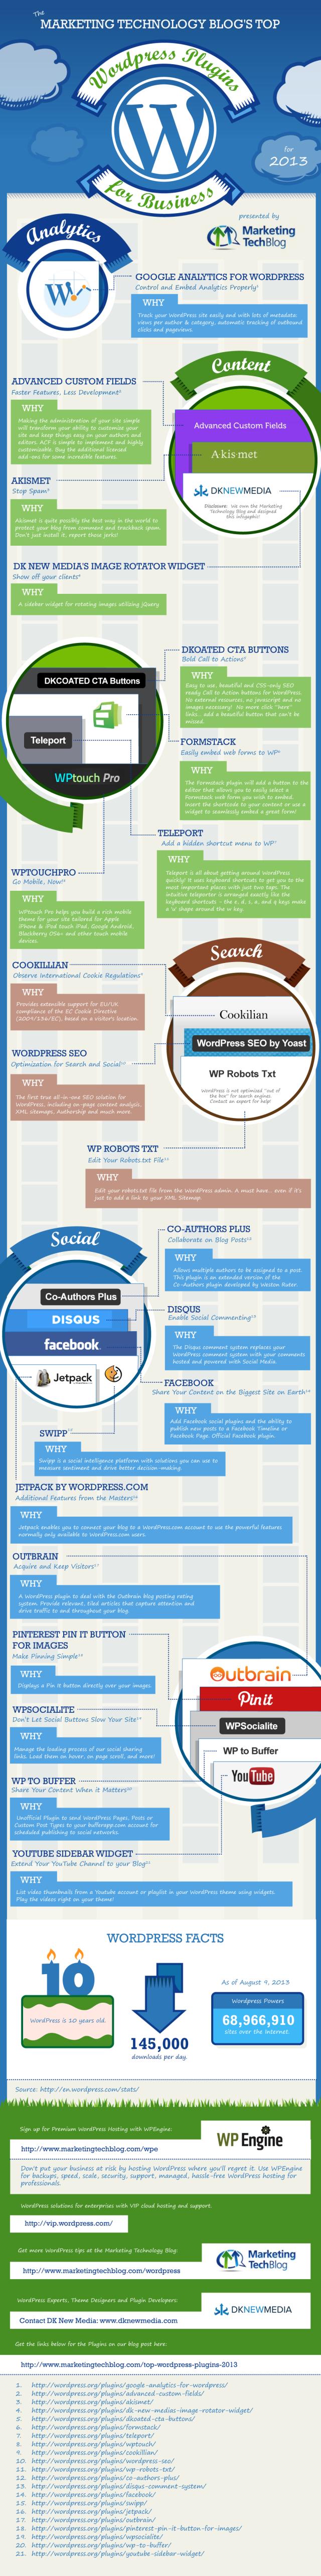 2013 Top Wordpress Plugins for Business web development